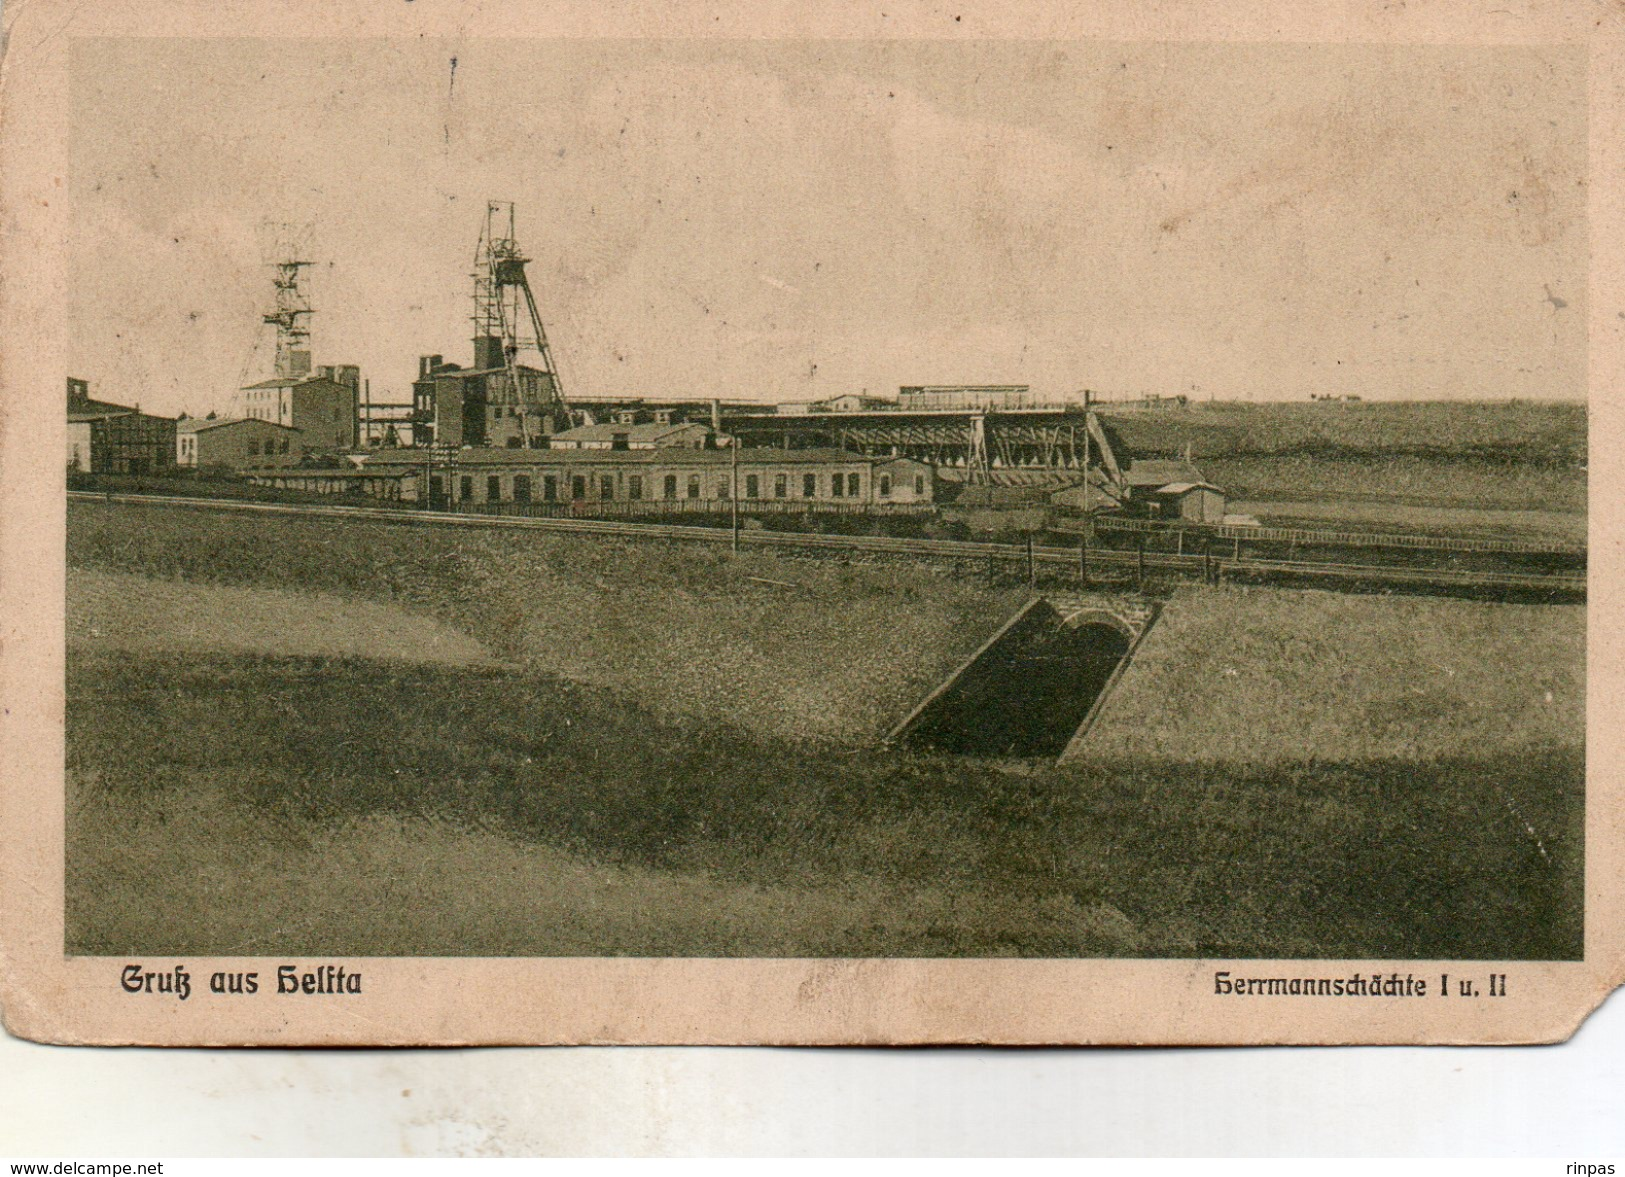 (Allemagne) HELFTA Gruss Aus Hermannschachte, Mine Chevalement Oblitéré P K Mulhausen Et Helfta En  1916 - Germany